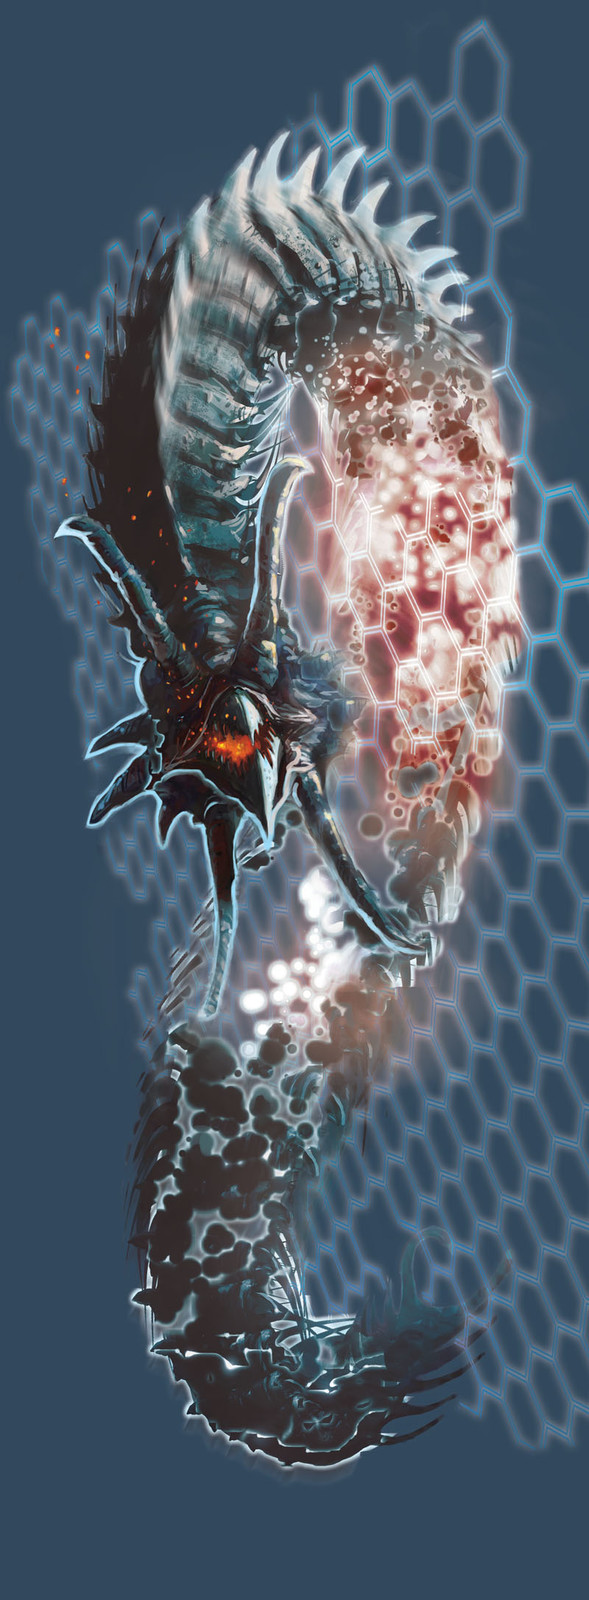 X Threats / Eclipse Phase Client: Posthuman Studios